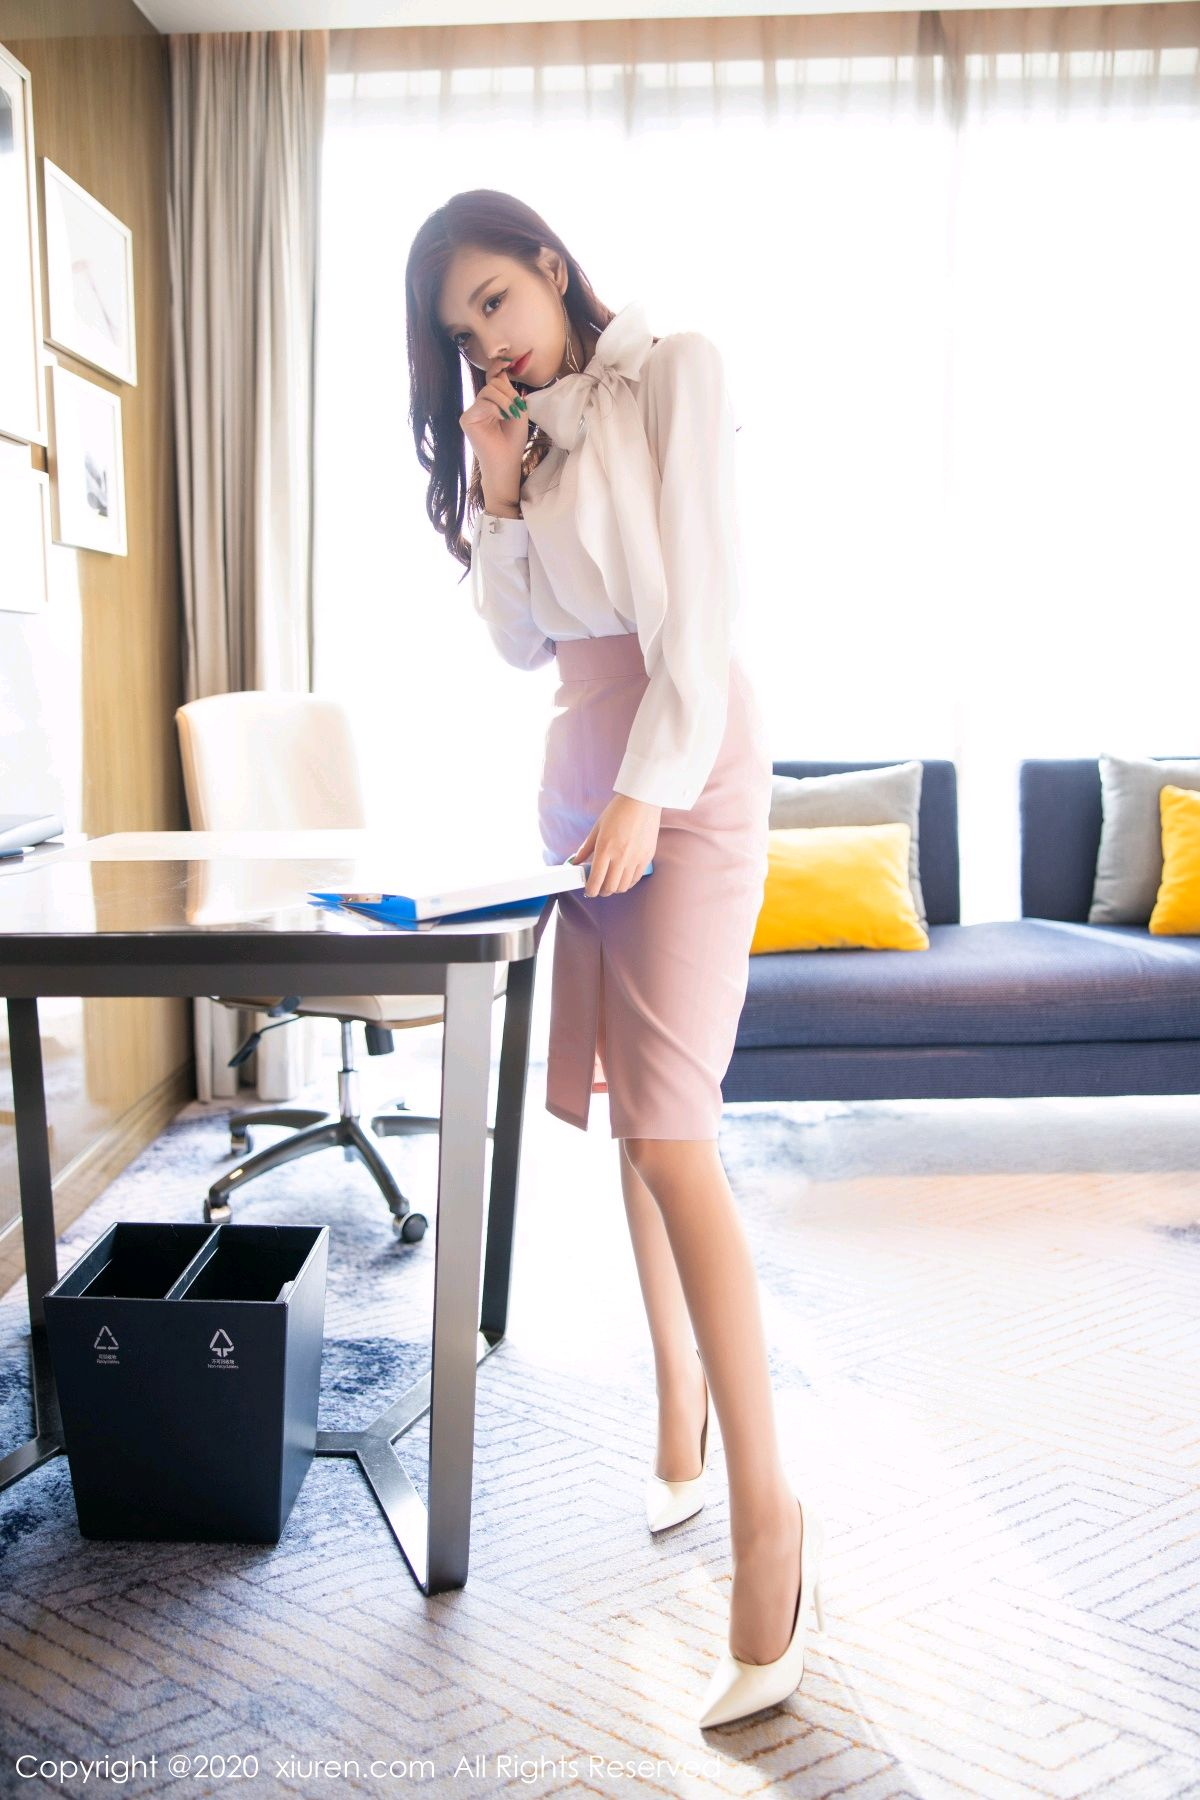 [XiuRen] Vol.2431 Yang Chen Chen 4P, Tall, Underwear, Uniform, Xiuren, Yang Chen Chen